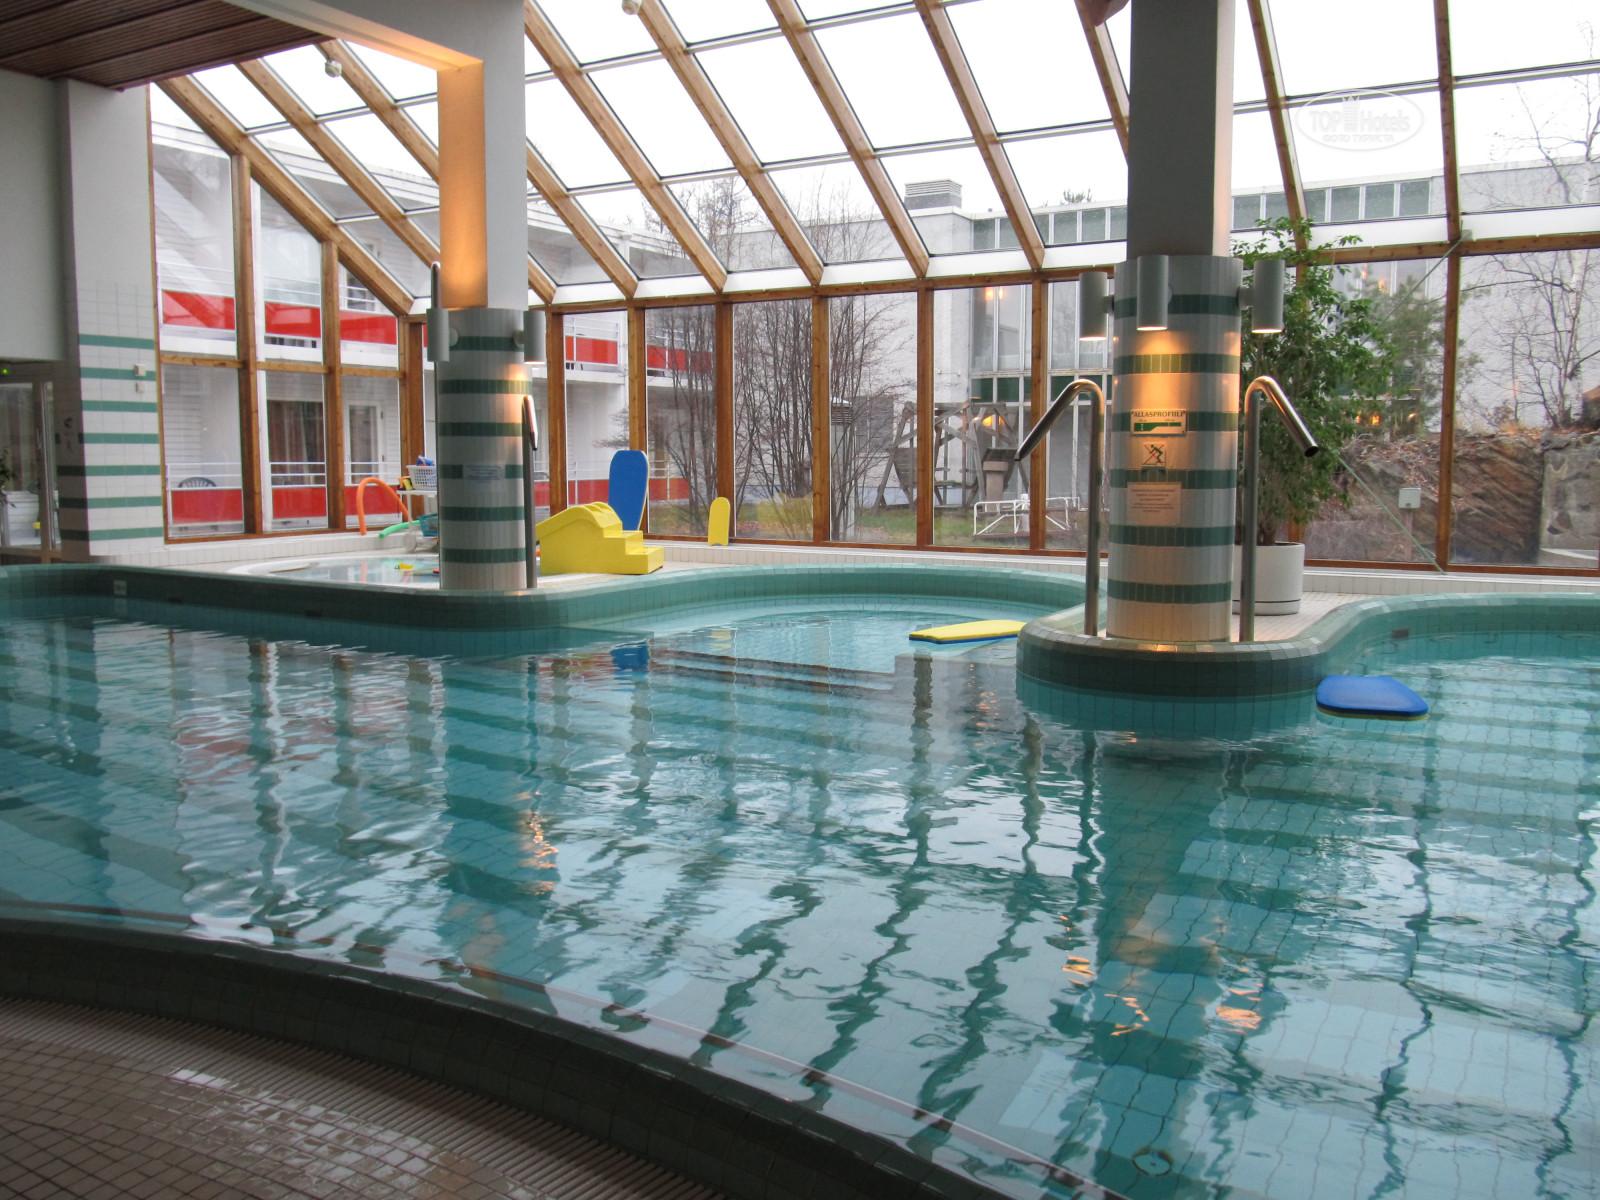 фото Казино финляндия отель савонлинна